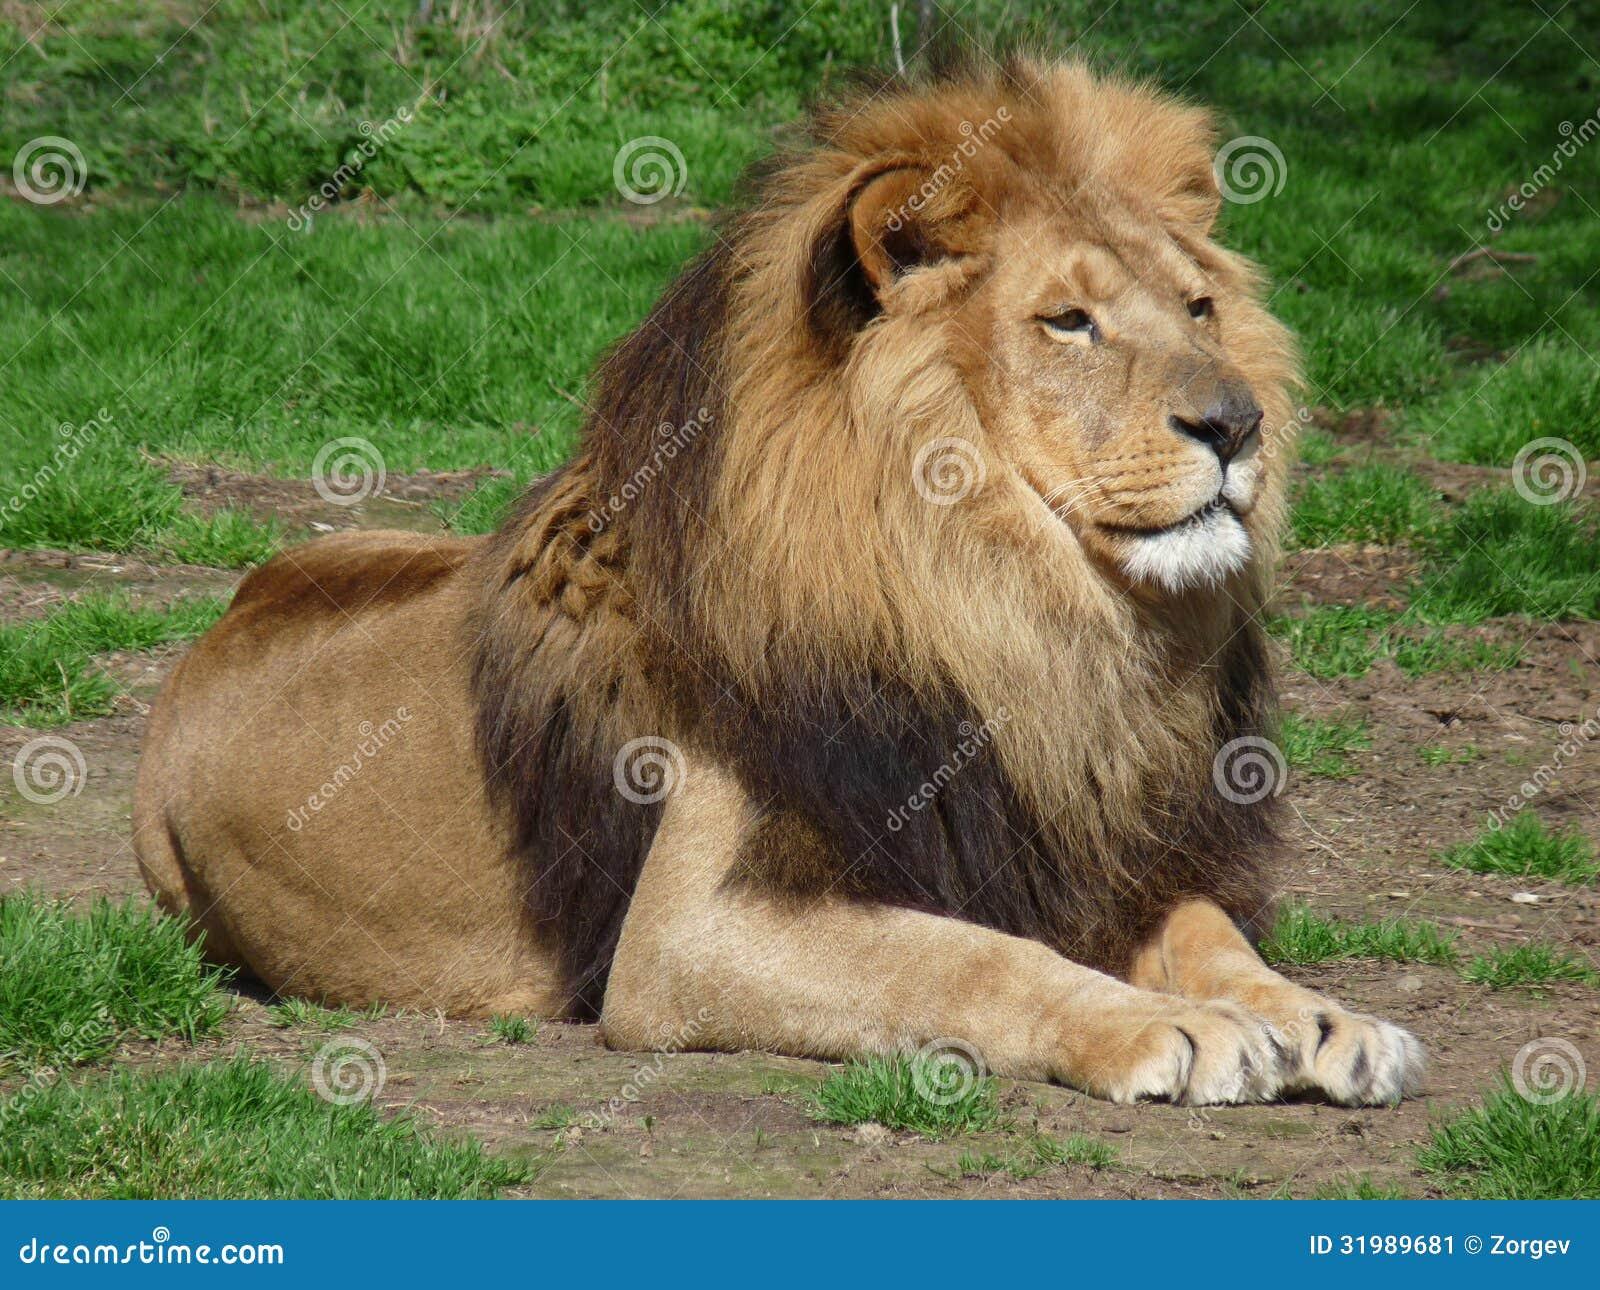 Lion sitting - photo#18